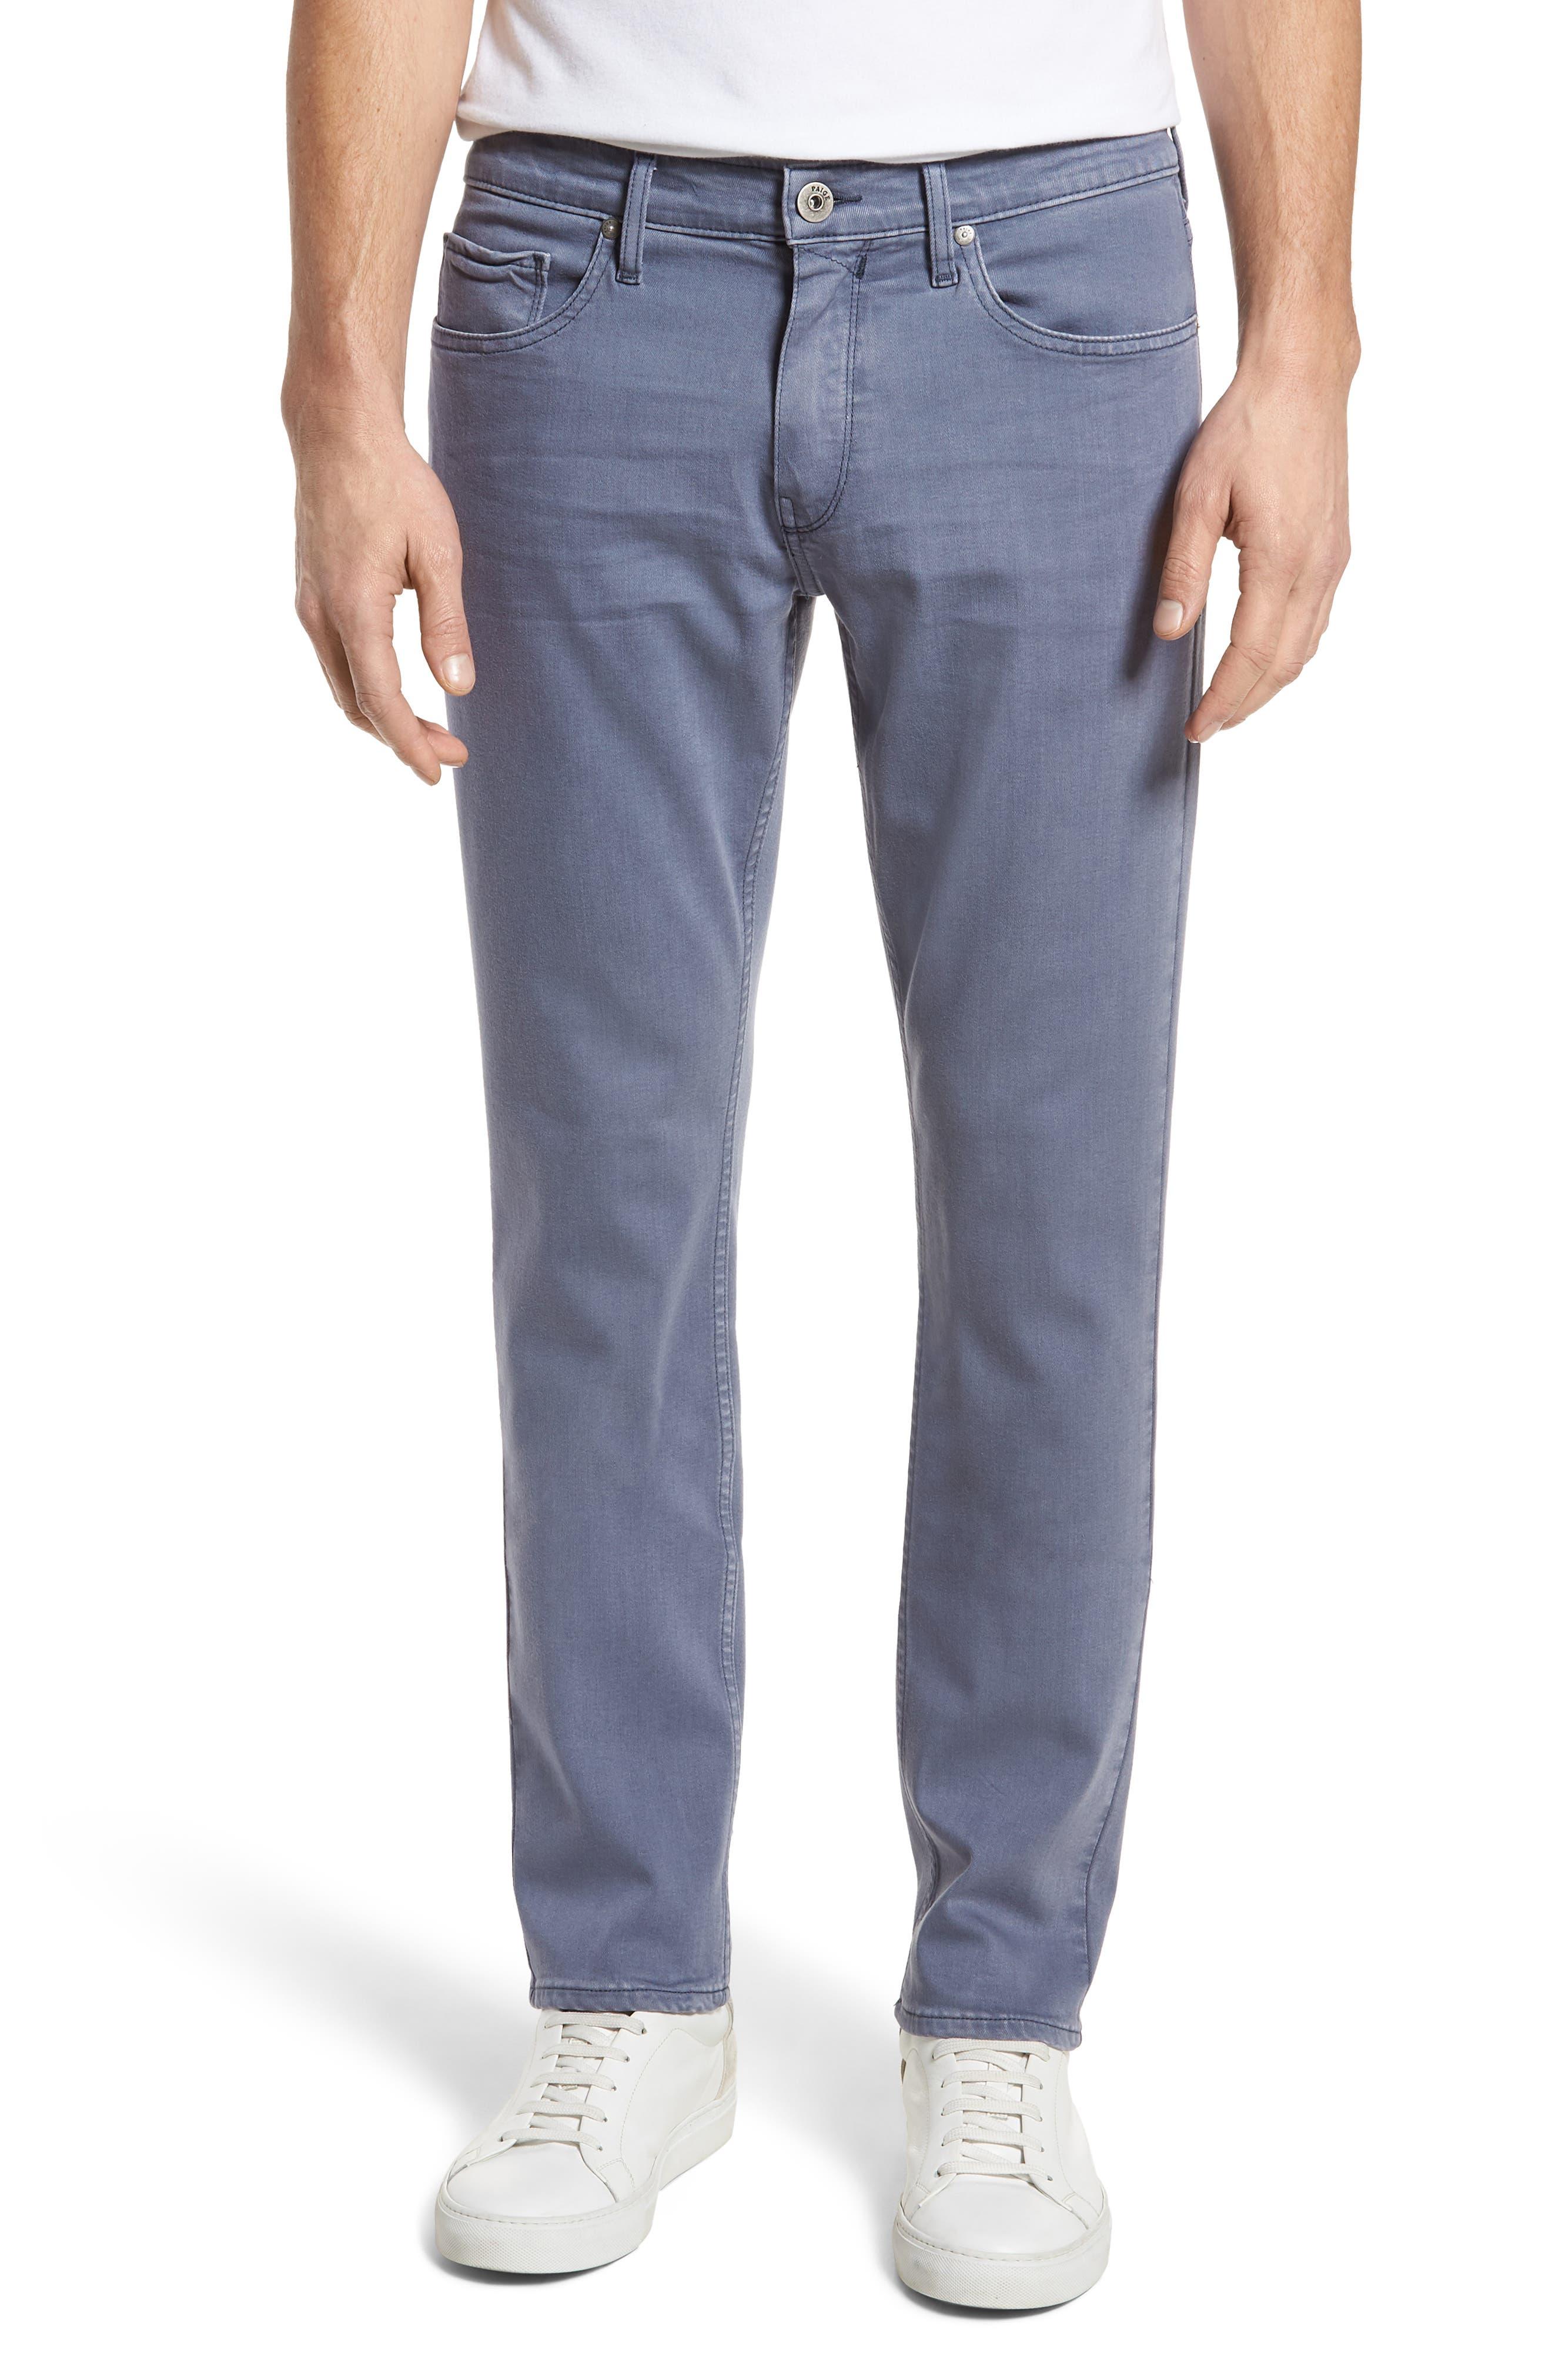 Transcend - Federal Slim Straight Leg Jeans,                             Main thumbnail 1, color,                             Vintage Smokey Blue